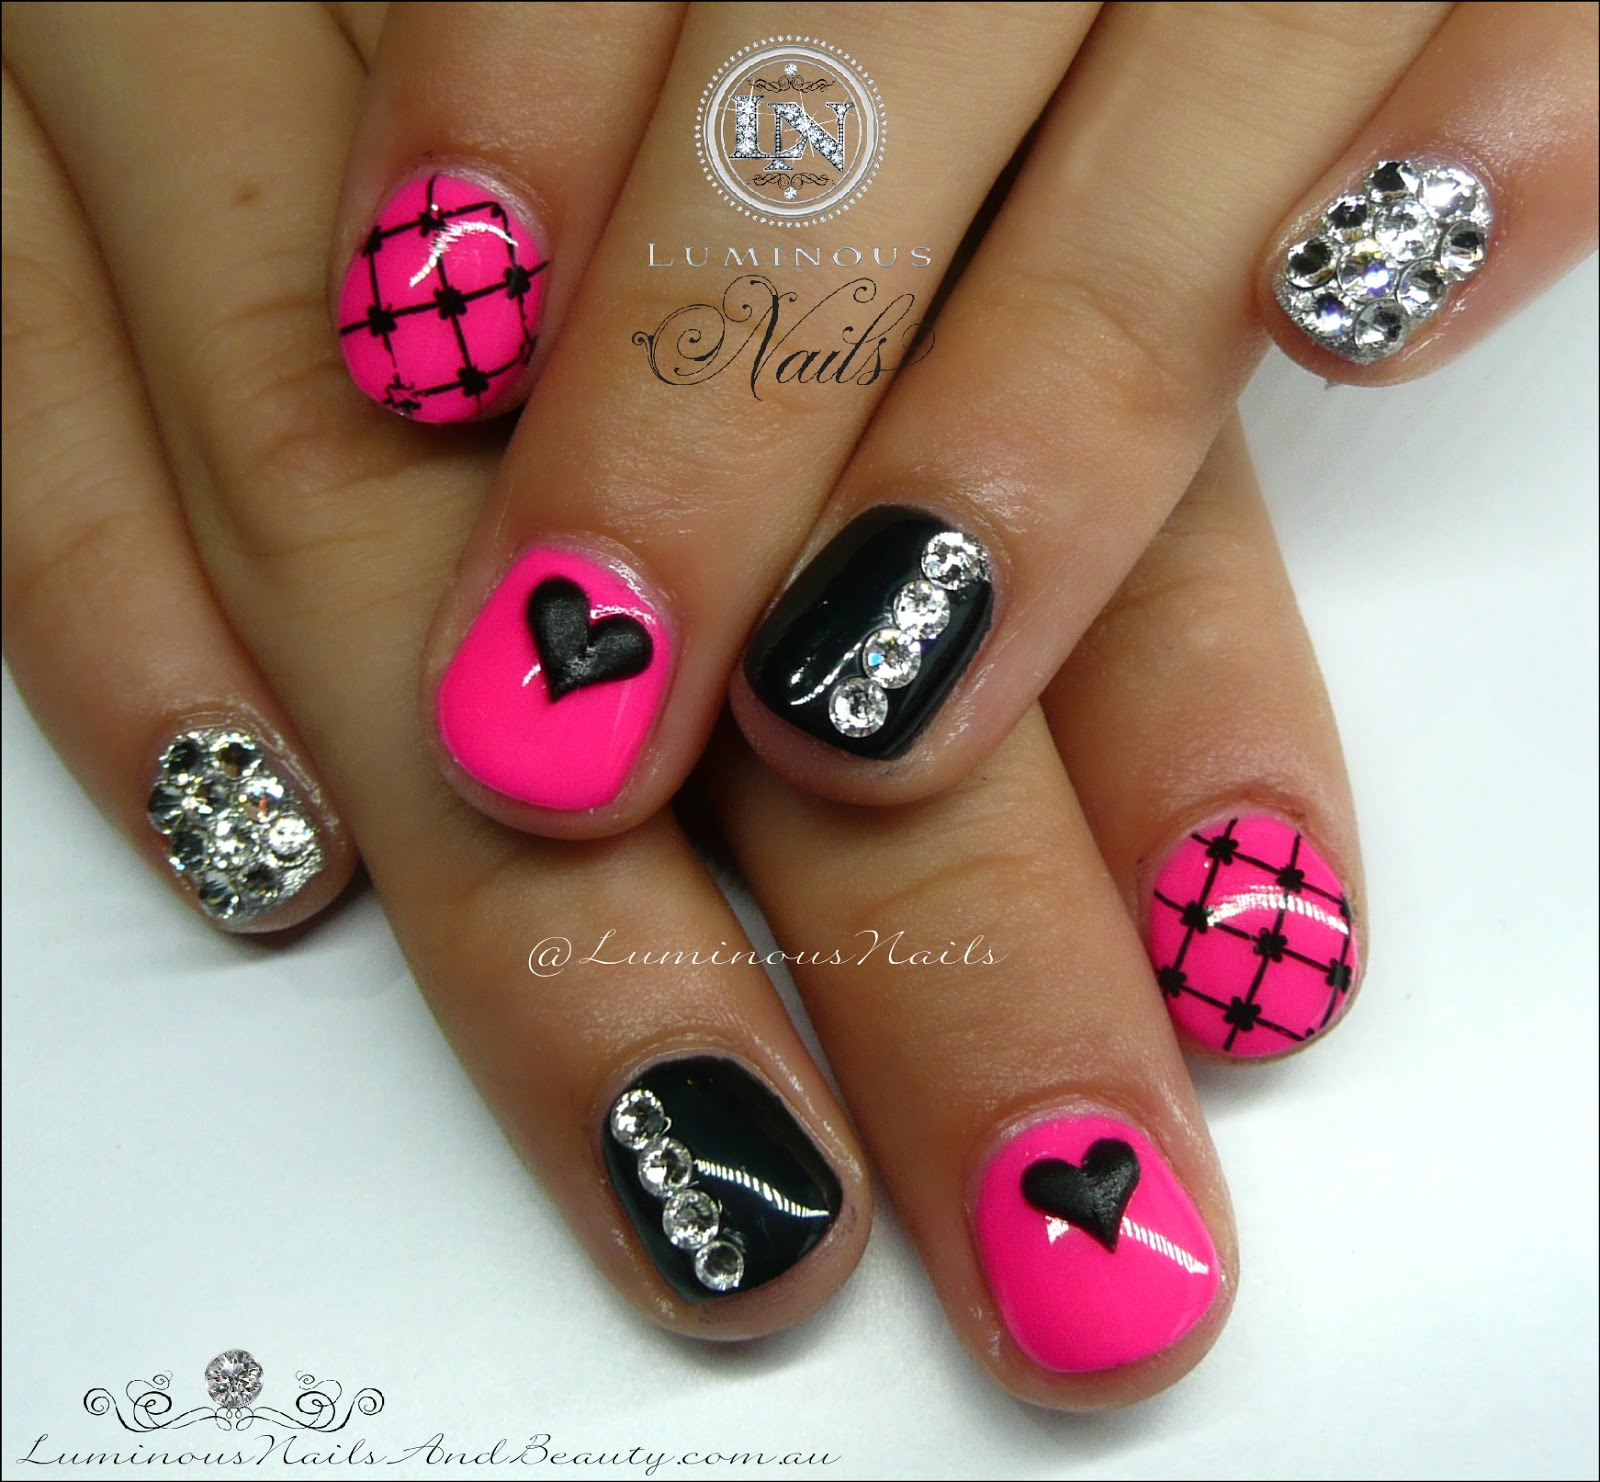 Luminous Nails: Cute Pink & Black Gel Nails for a Cute ...